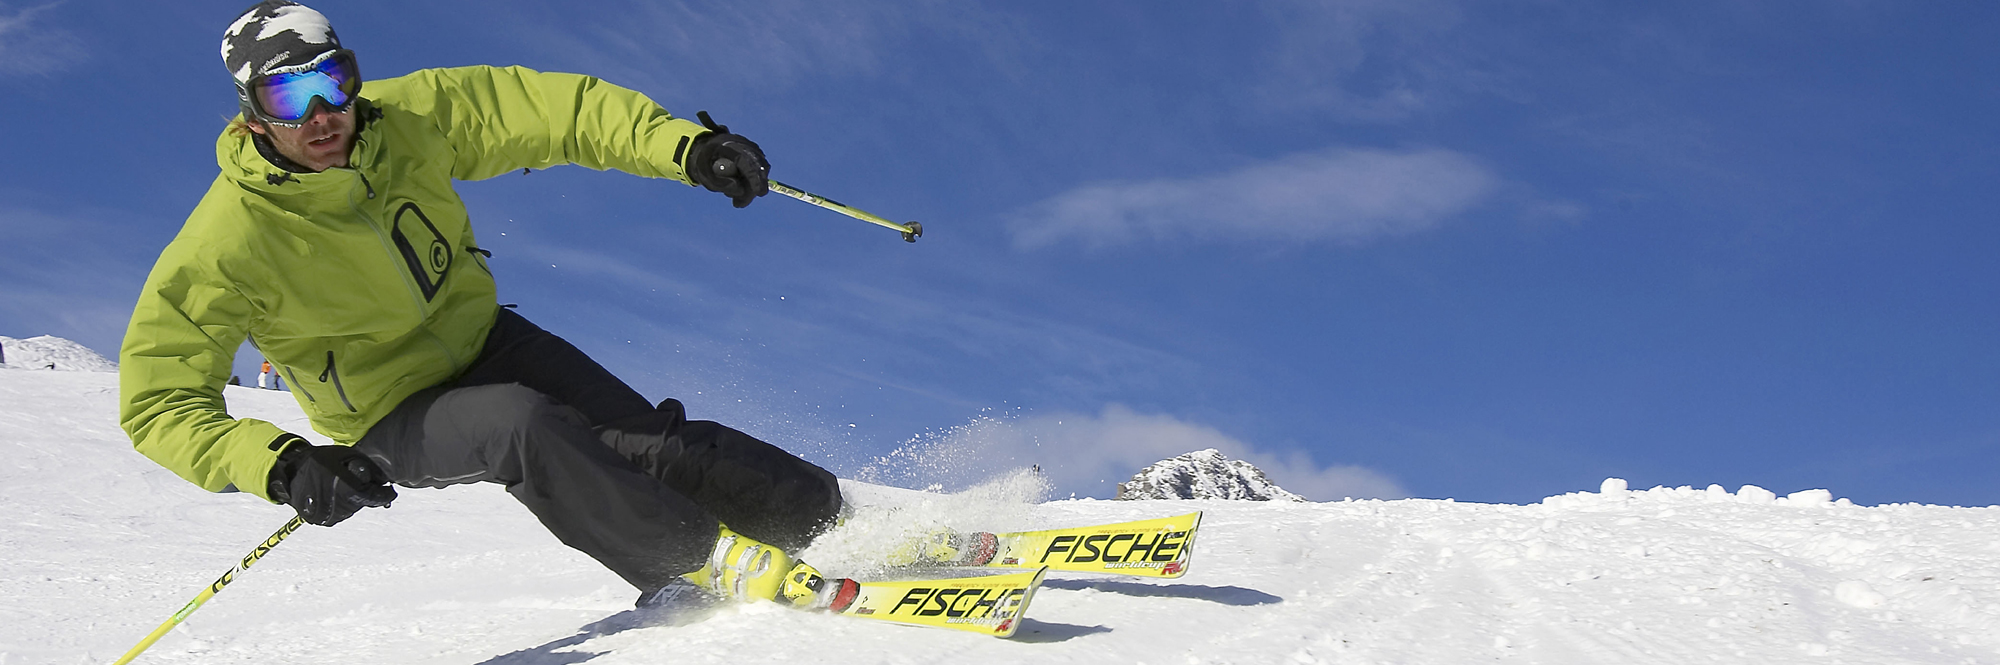 Skifahren im Allgäu, Ofterschwang